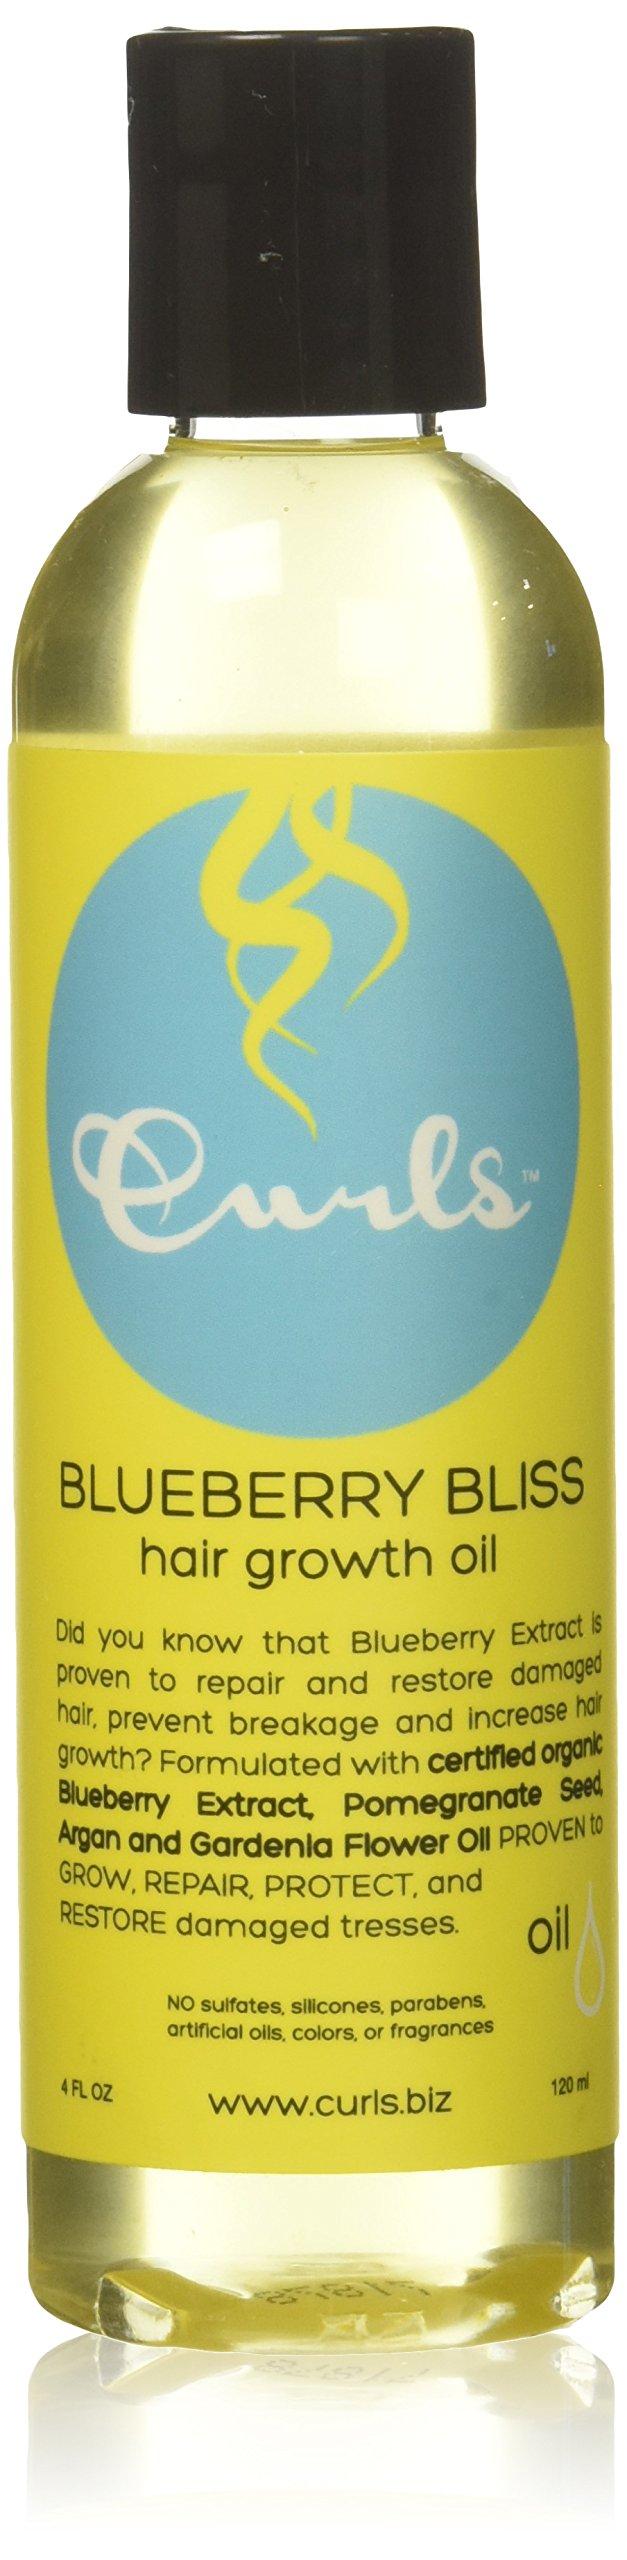 Curls Bliss Hair Growth Oil, Blueberry, 4 oz.